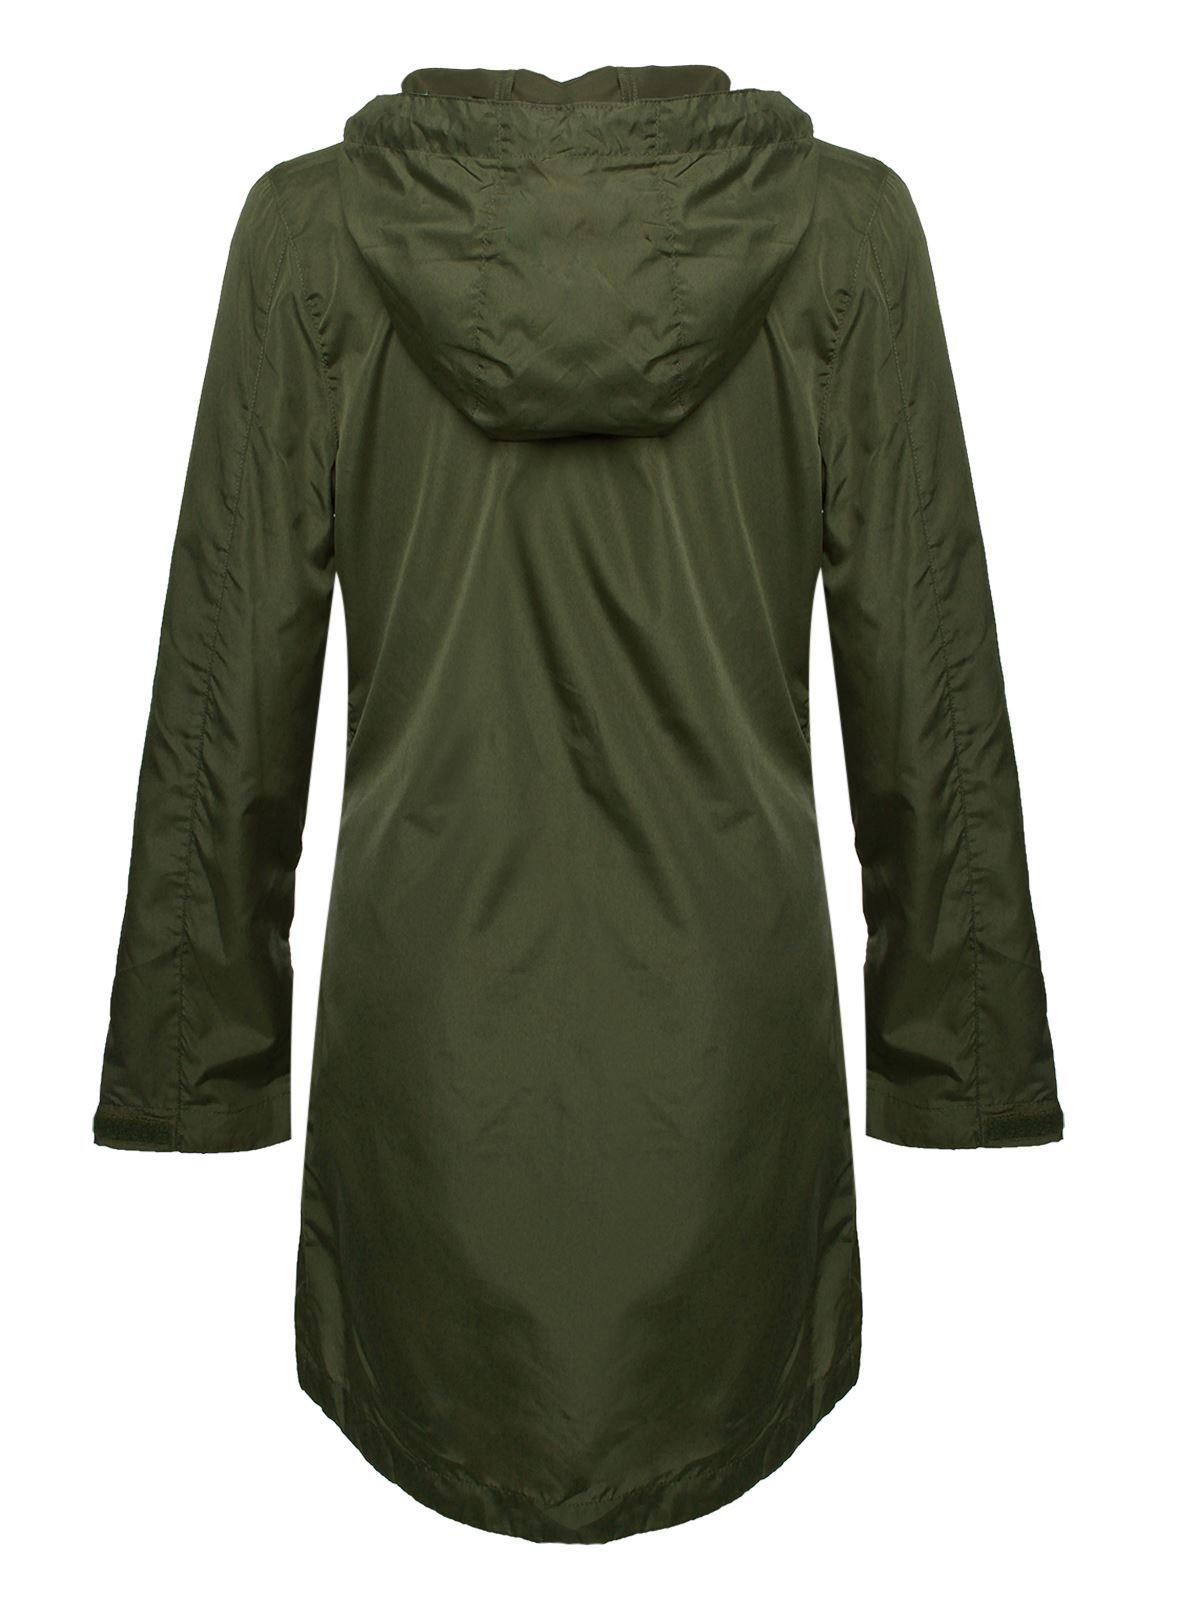 Para-Mujer-Damas-Alma-valiente-showerproof-Plain-parka-con-capucha-lluvia-con-cremallera-chaqueta miniatura 4